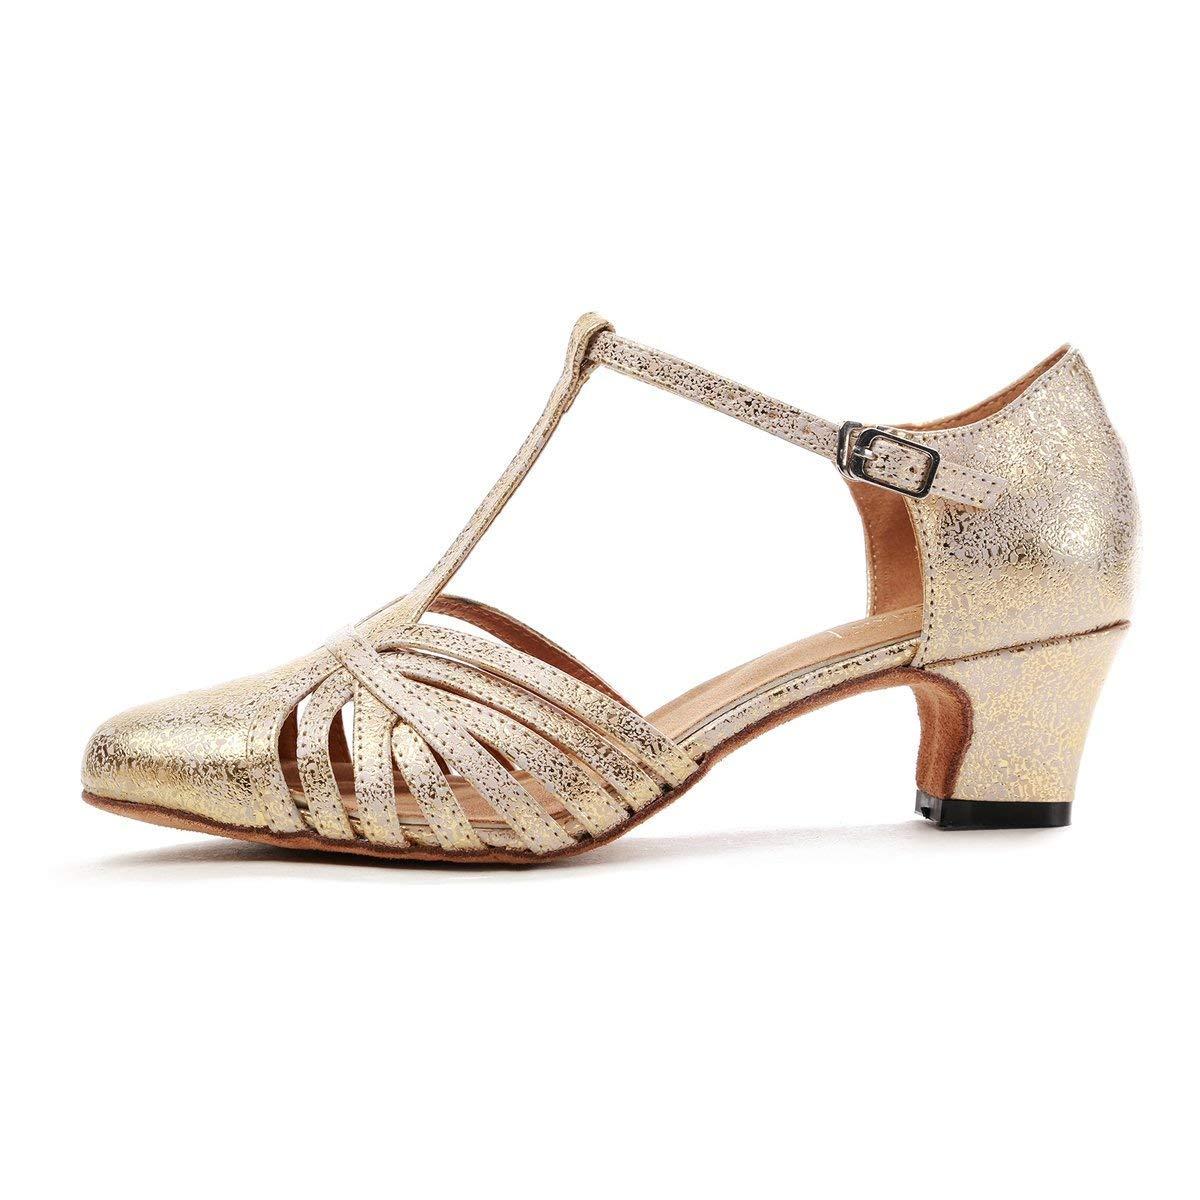 Qiusa GL259 Frauen T-Strap T-Strap T-Strap Mode Synthetische Latin Ballroom Dance Schuhe Party Pumps (Farbe   Gold-5cm Heel, Größe   2 UK) c1d1aa